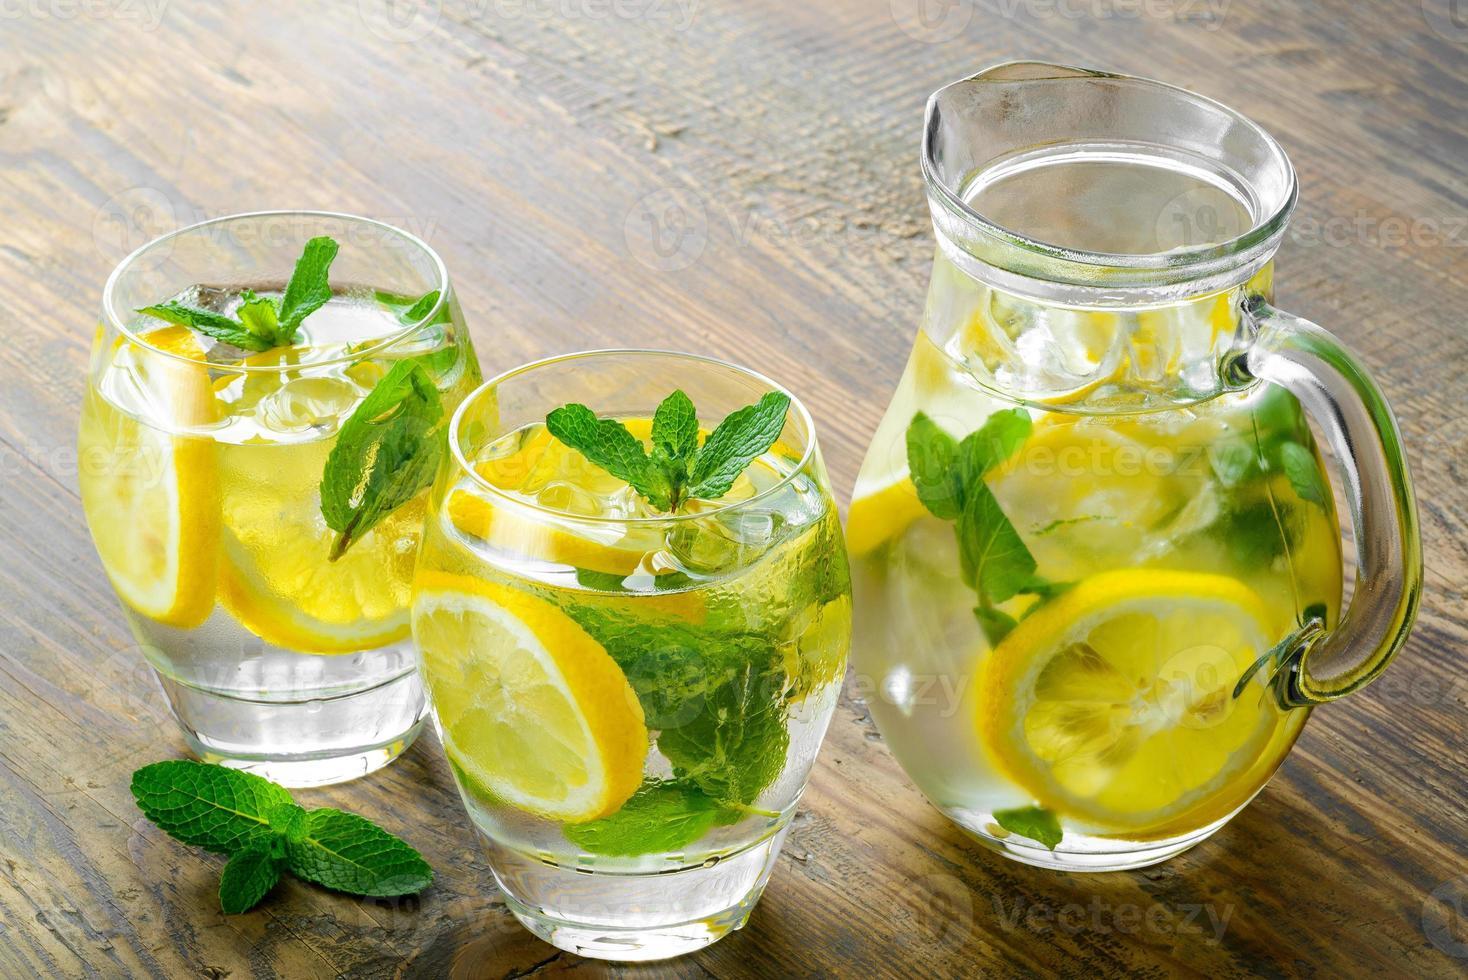 vers water met citroen, munt en komkommer foto